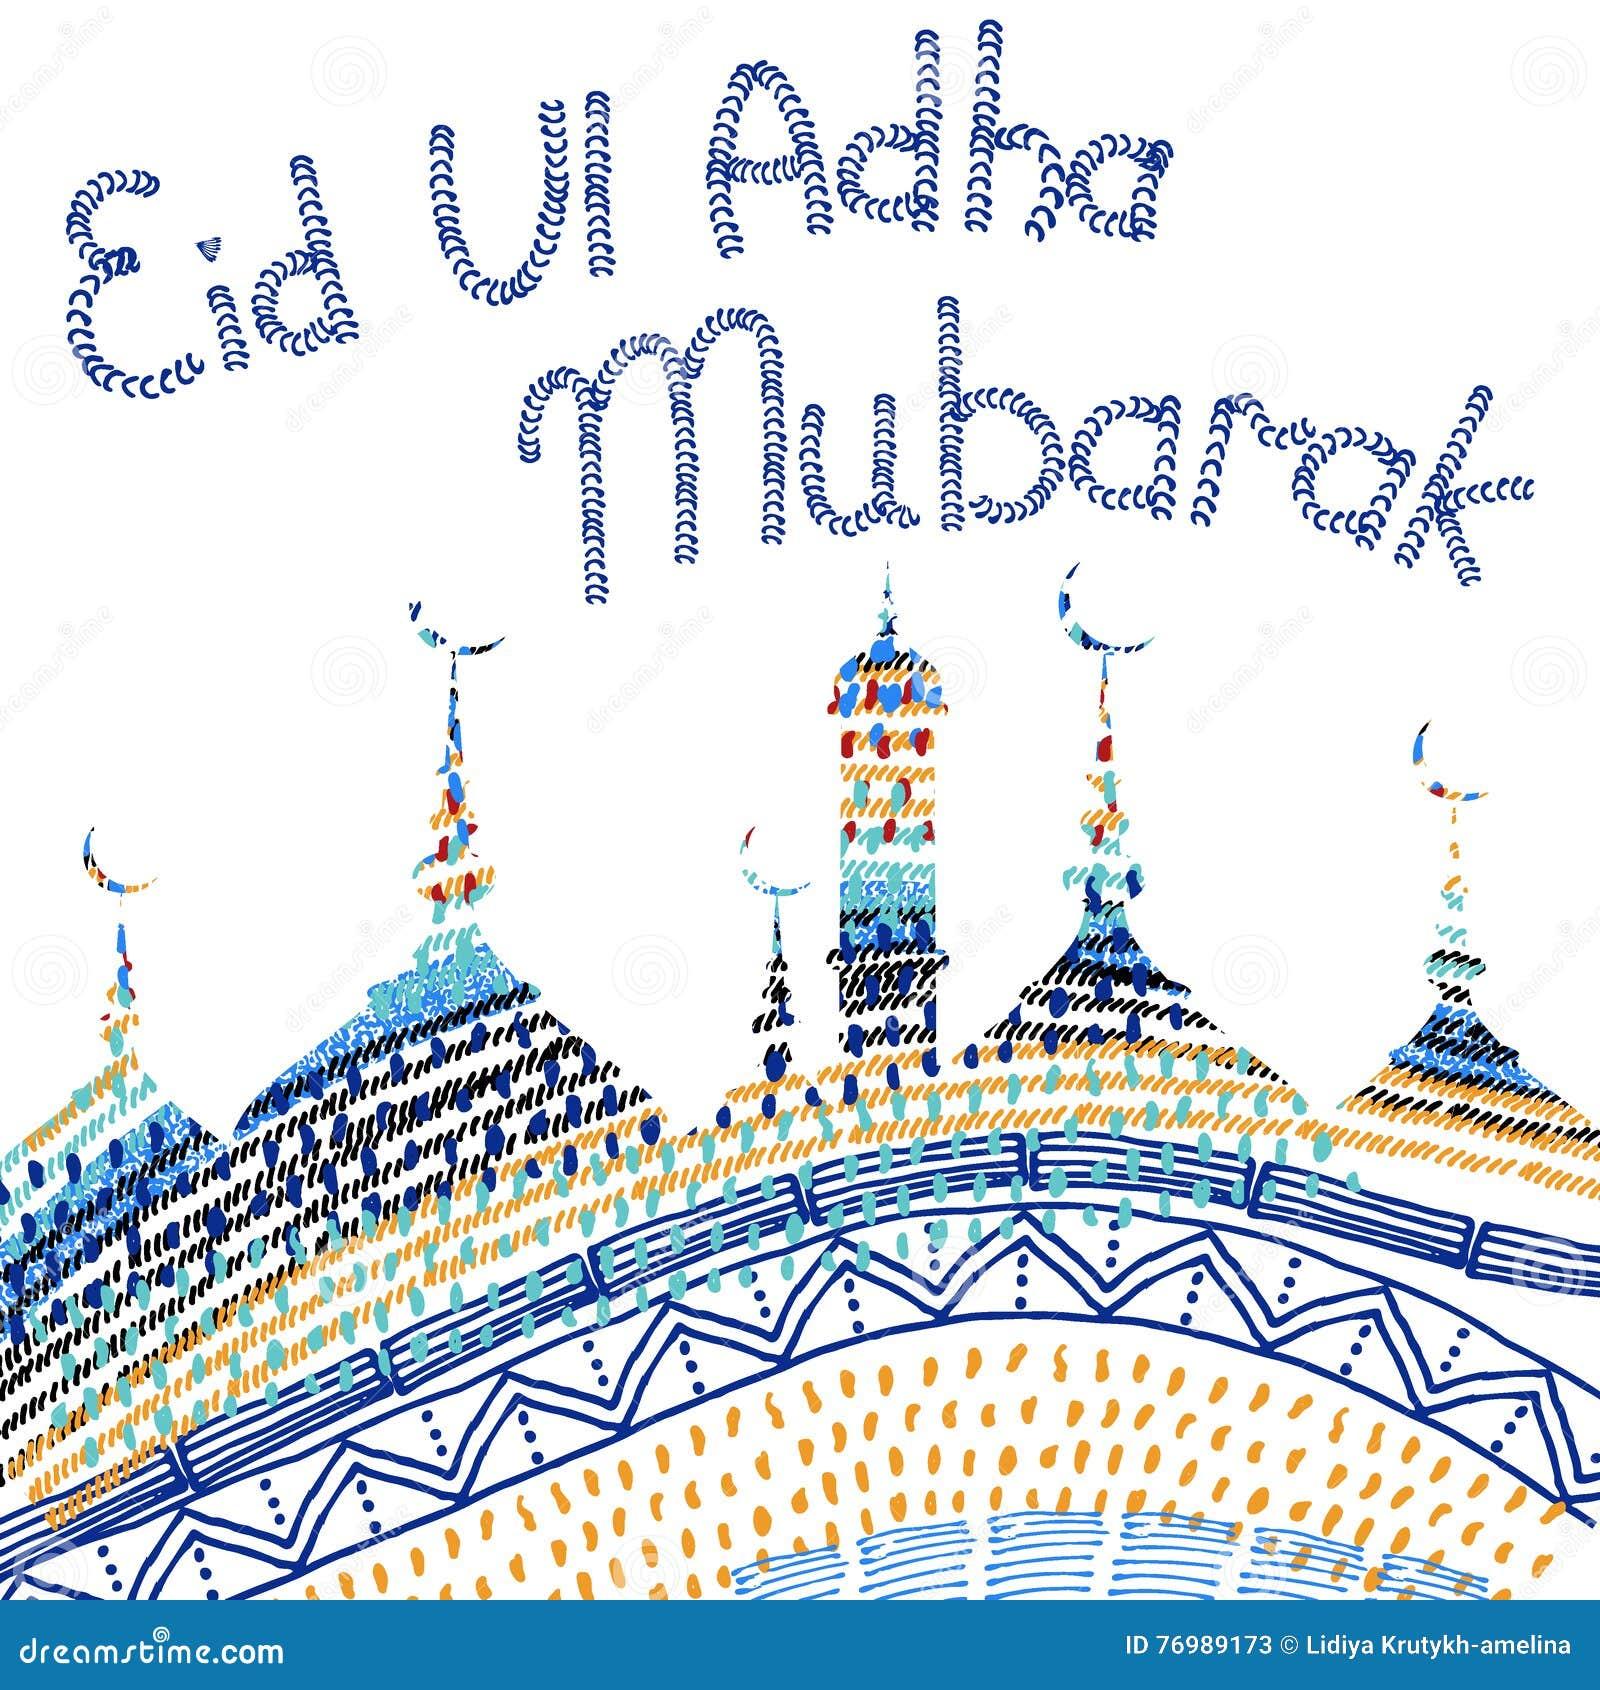 Eid mubarak vector sketch mosque translation of text eid ul eid mubarak vector sketch mosque translation of text eid ul adha mubarak happy blessed festival of sacrifice kristyandbryce Image collections